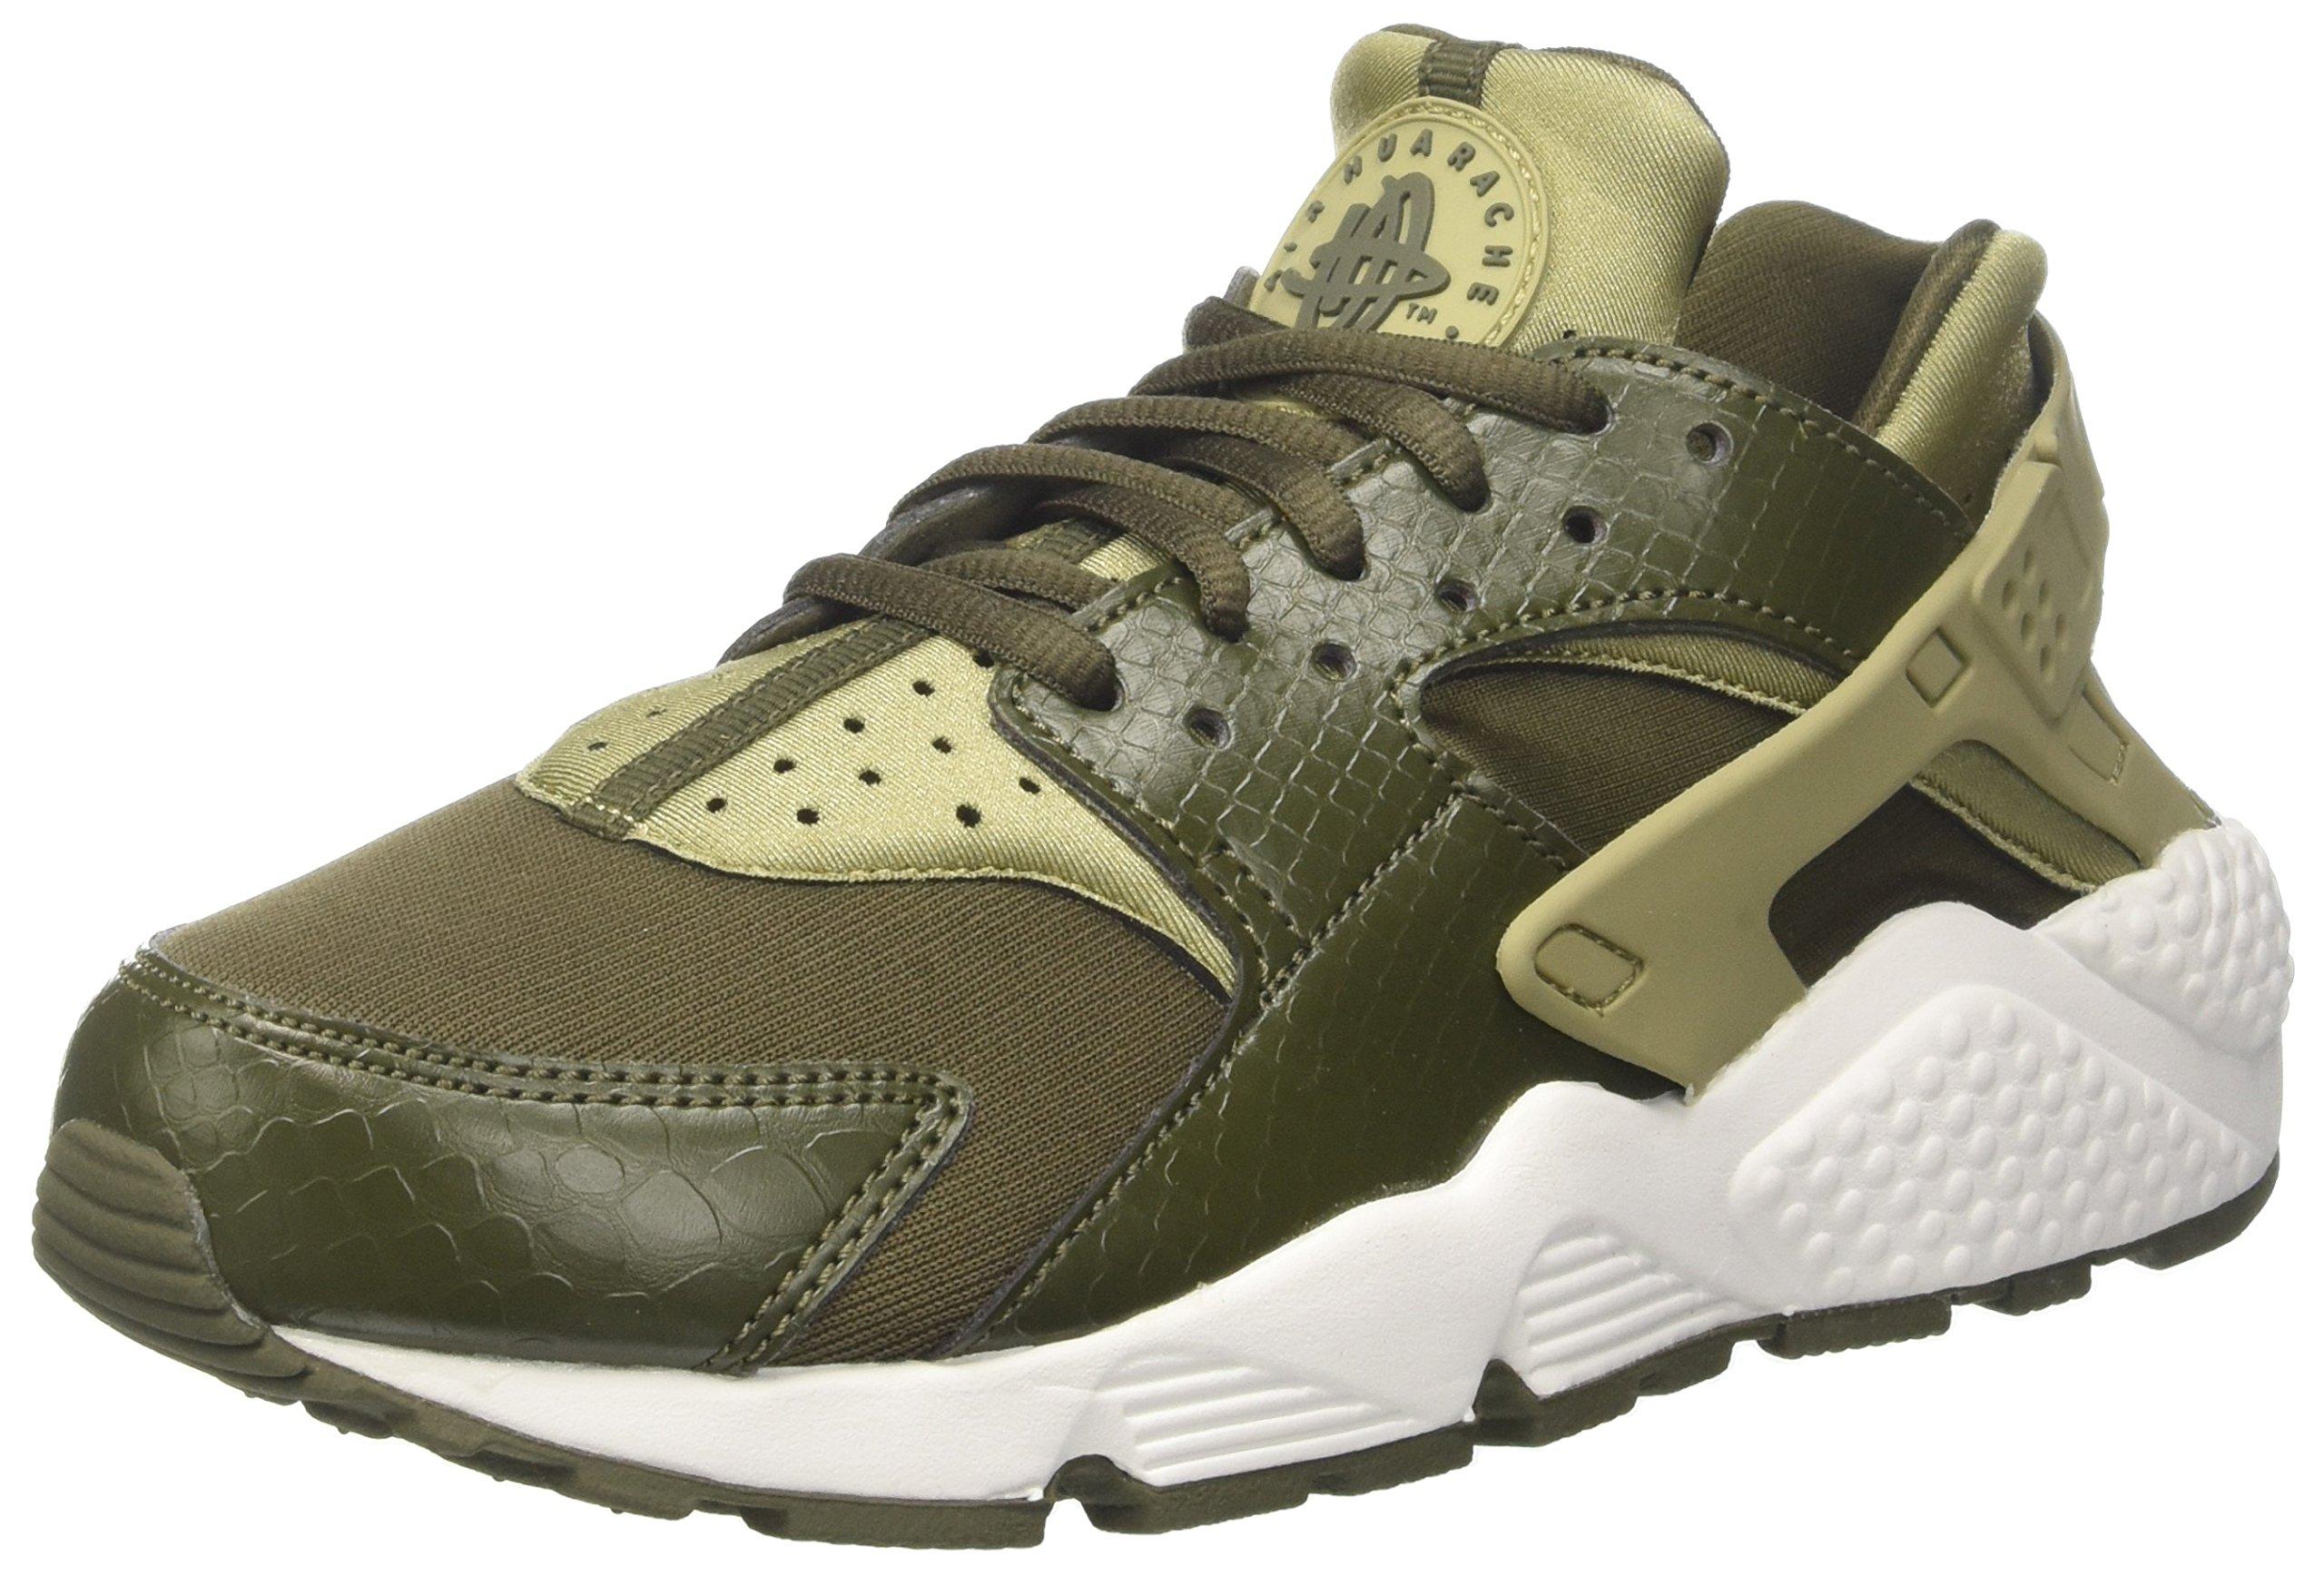 08b044c746 Galleon - Nike Women's Air Huarache Run Gymnastics Shoes, Green (Neutral  Olive/Cargo Khaki/Summ 201), 4.5 UK